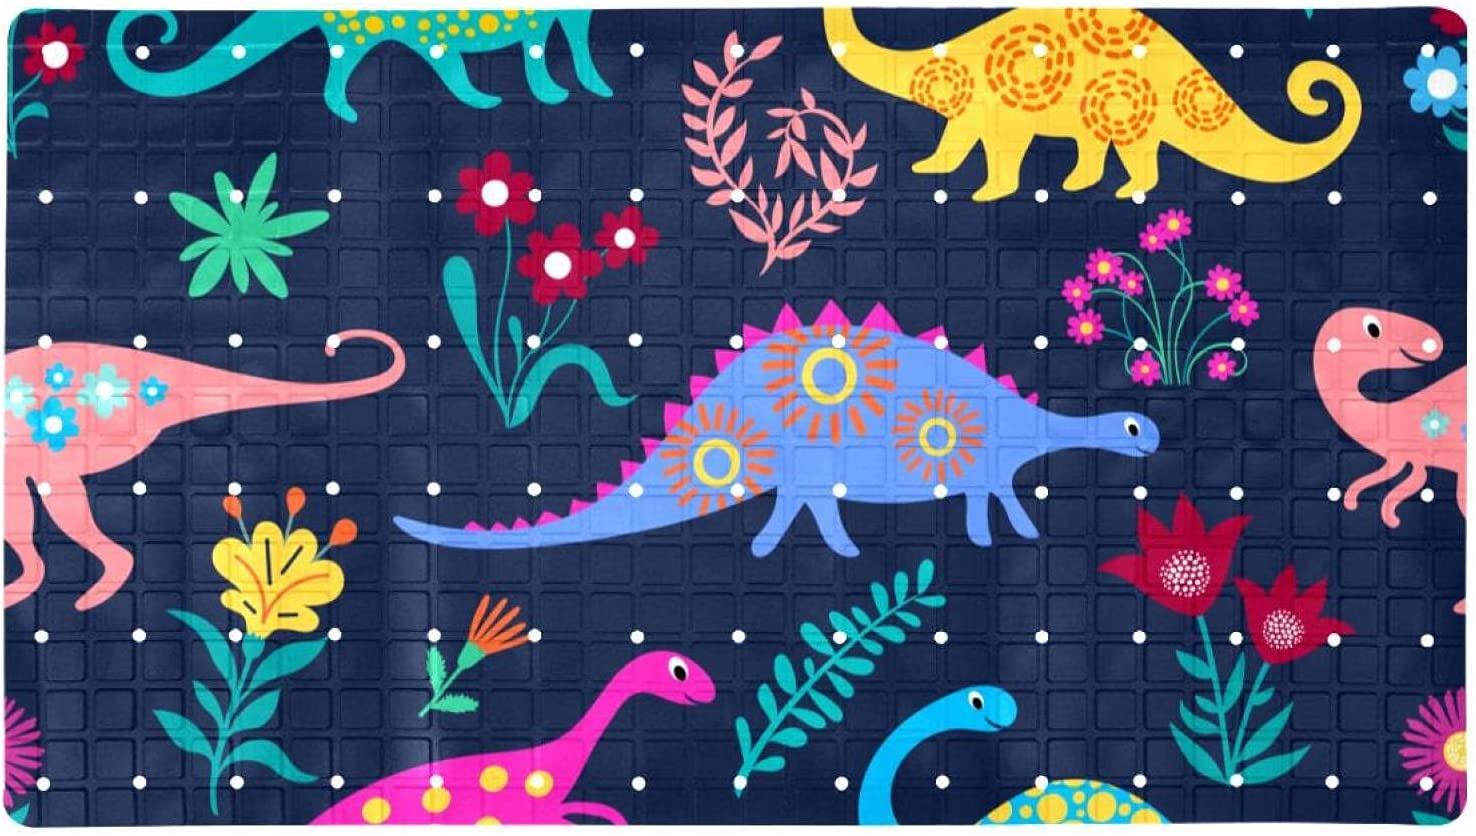 Bath Tub 5 ☆ popular Shower Mat Dinosaurs-Blue-Pattern Ranking TOP9 Prin 15.7x27.9 inches